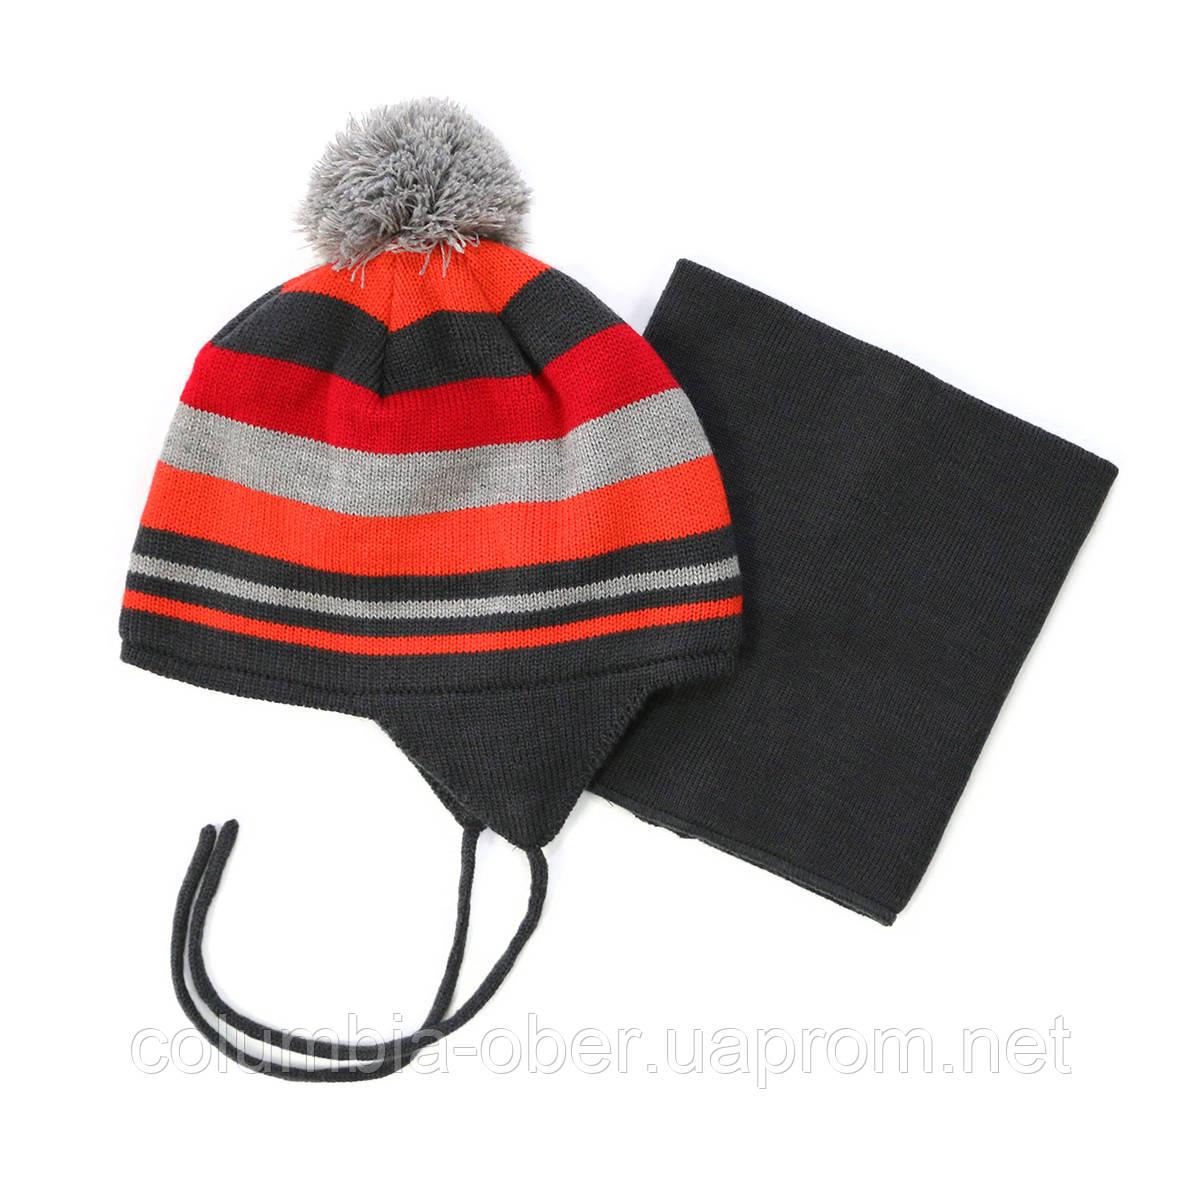 Зимняя шапка+манишка для мальчика PELUCHE 63 EG ACC F16 Kimono. Размер 3/5 и 6/8.